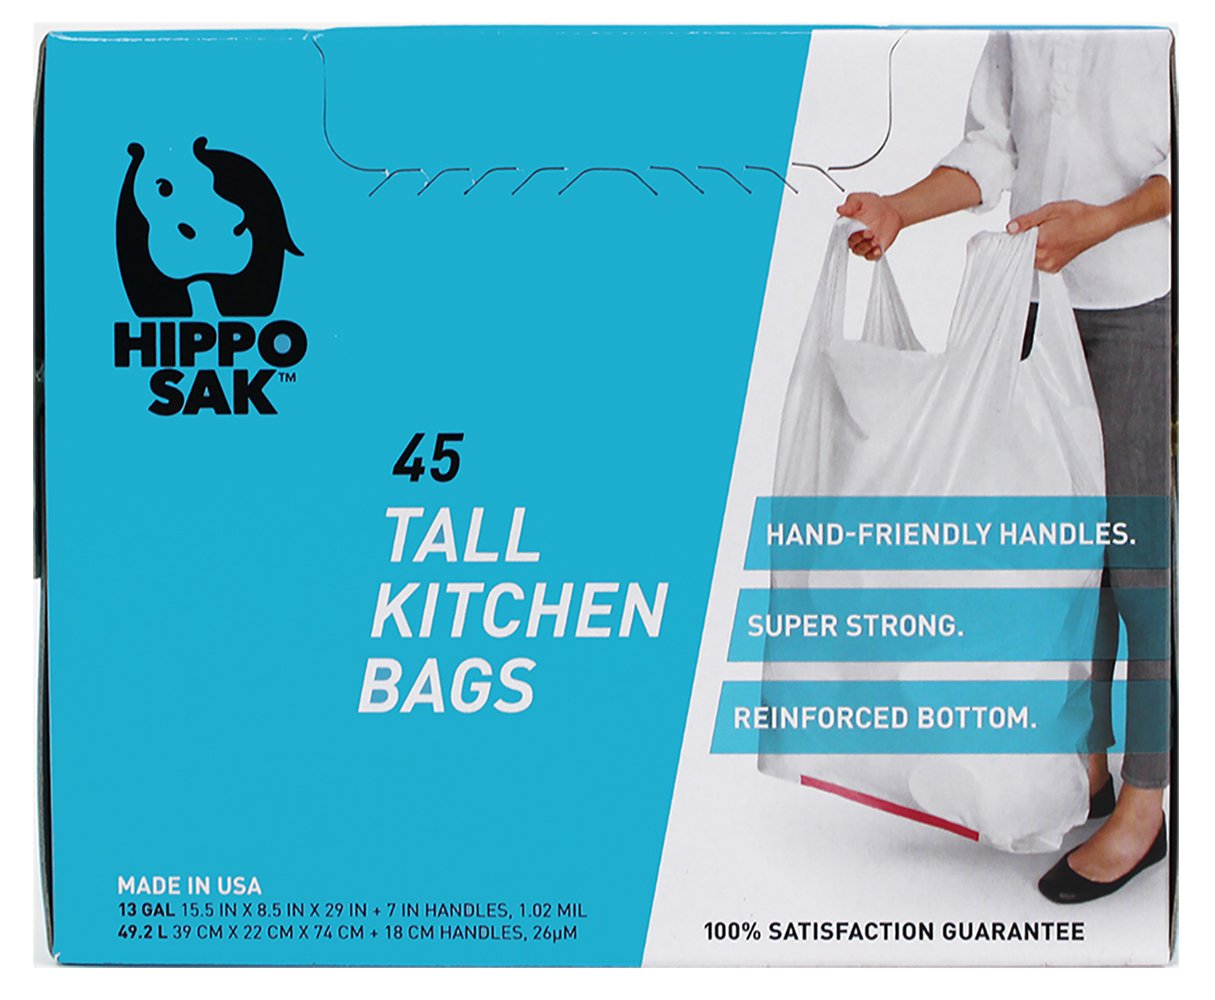 Hippo Sak 13 gallon tall kitchen trash by Hippo Sak (Image #1)